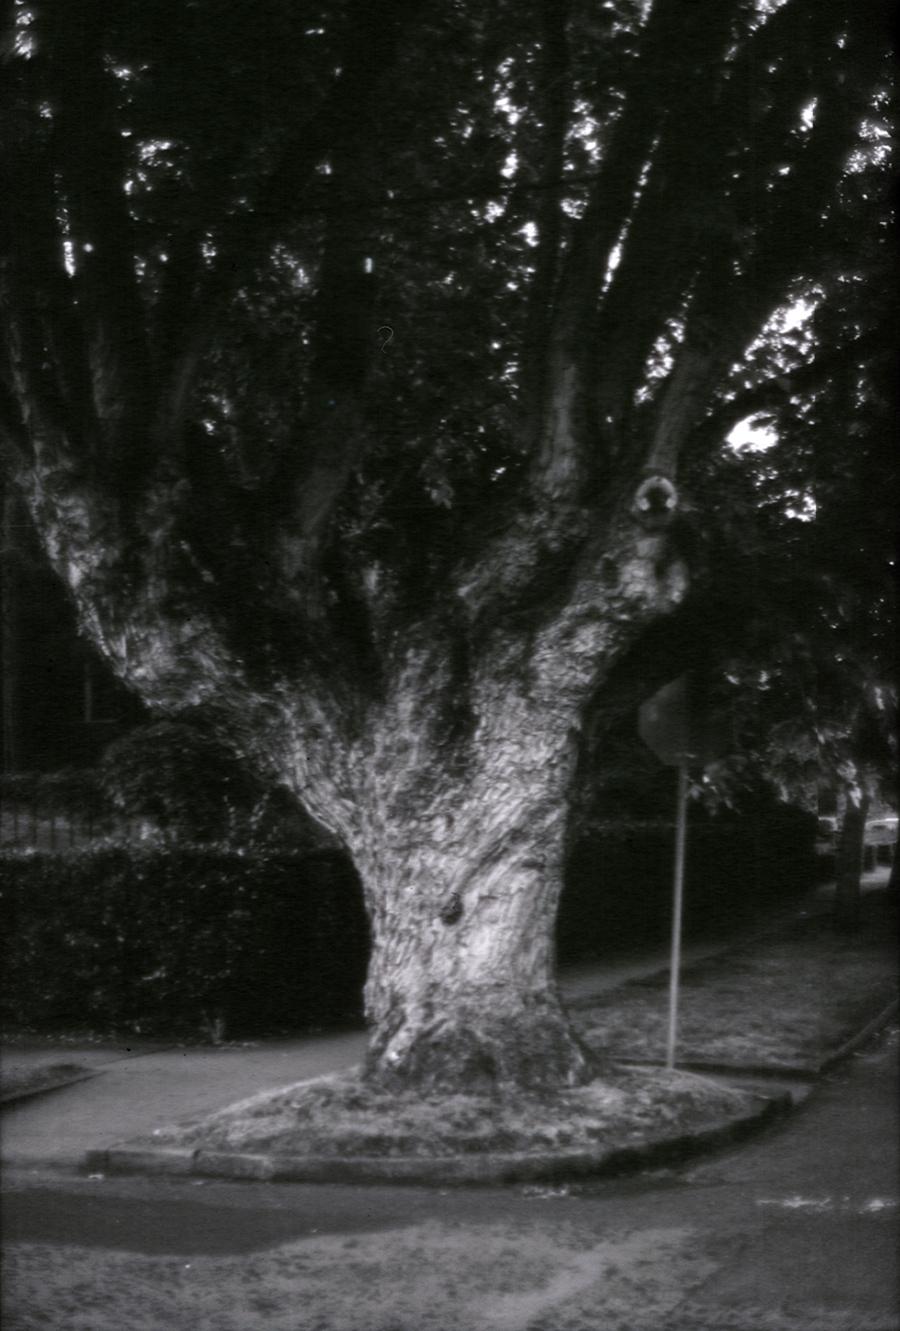 pdx-hancocktree_mattschu_insta.jpg